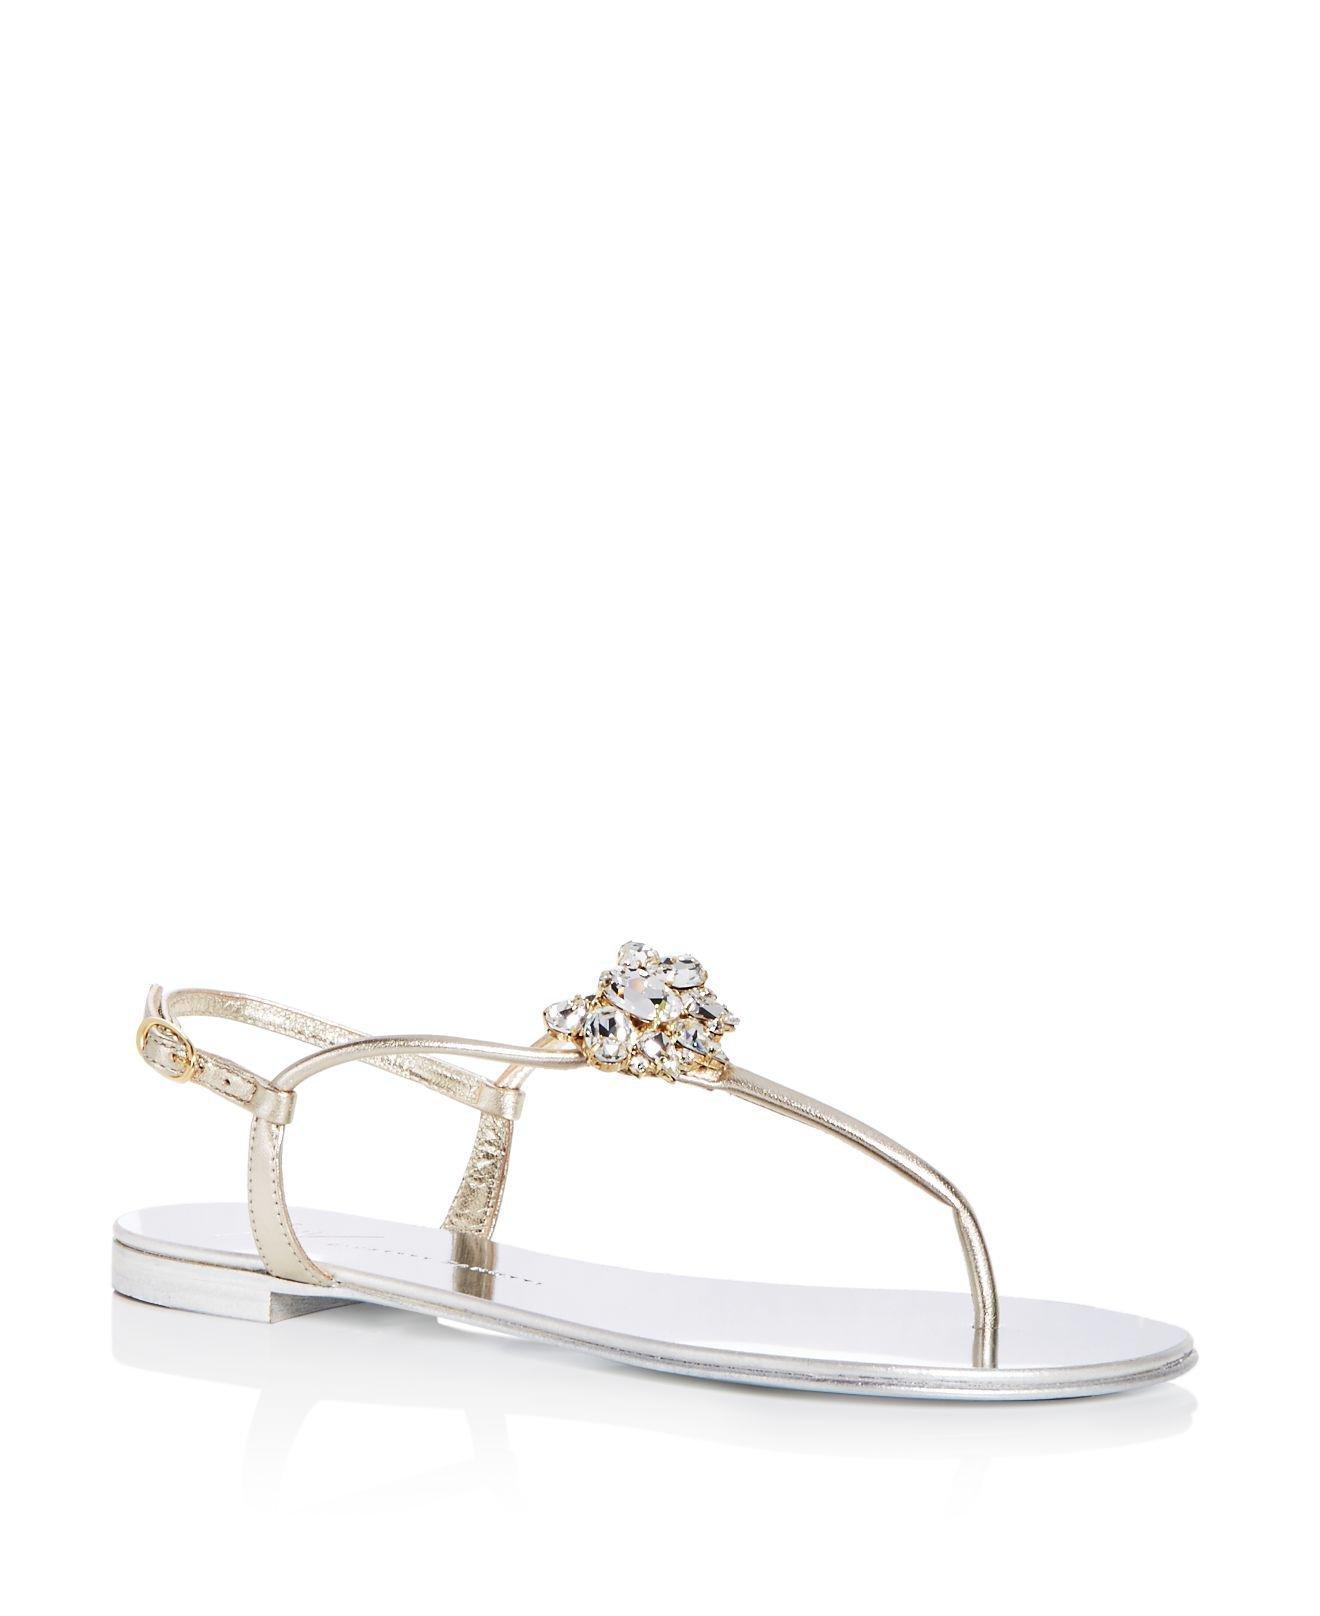 Giuseppe Zanotti Women's Nuvorock Swarovski Crystal Embellished Slide Sandals gr9qvYwOP